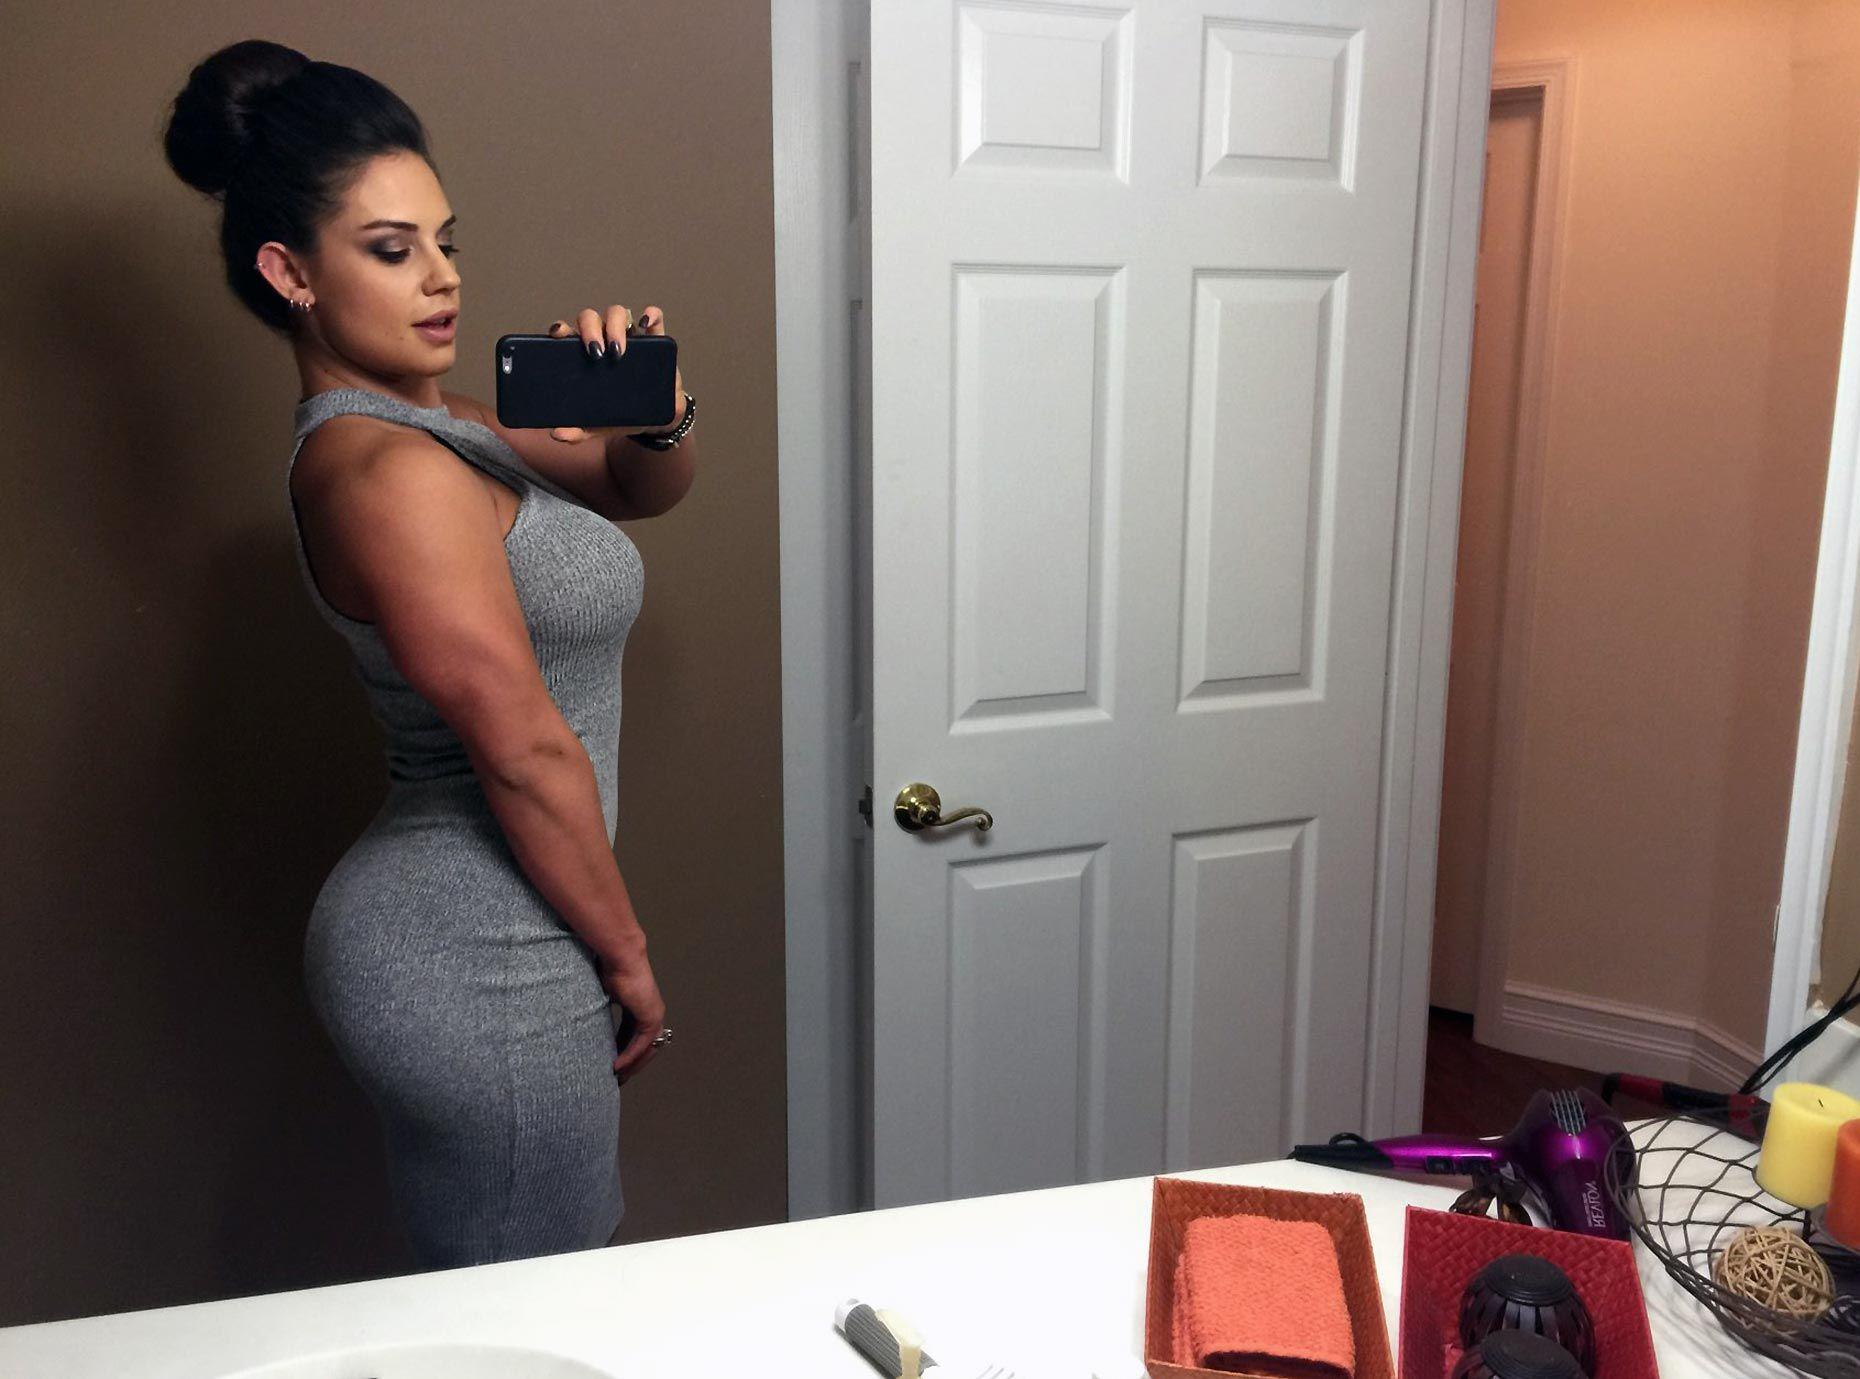 Celeste Bonin Nude Leaked The Fappening & Sexy 0158